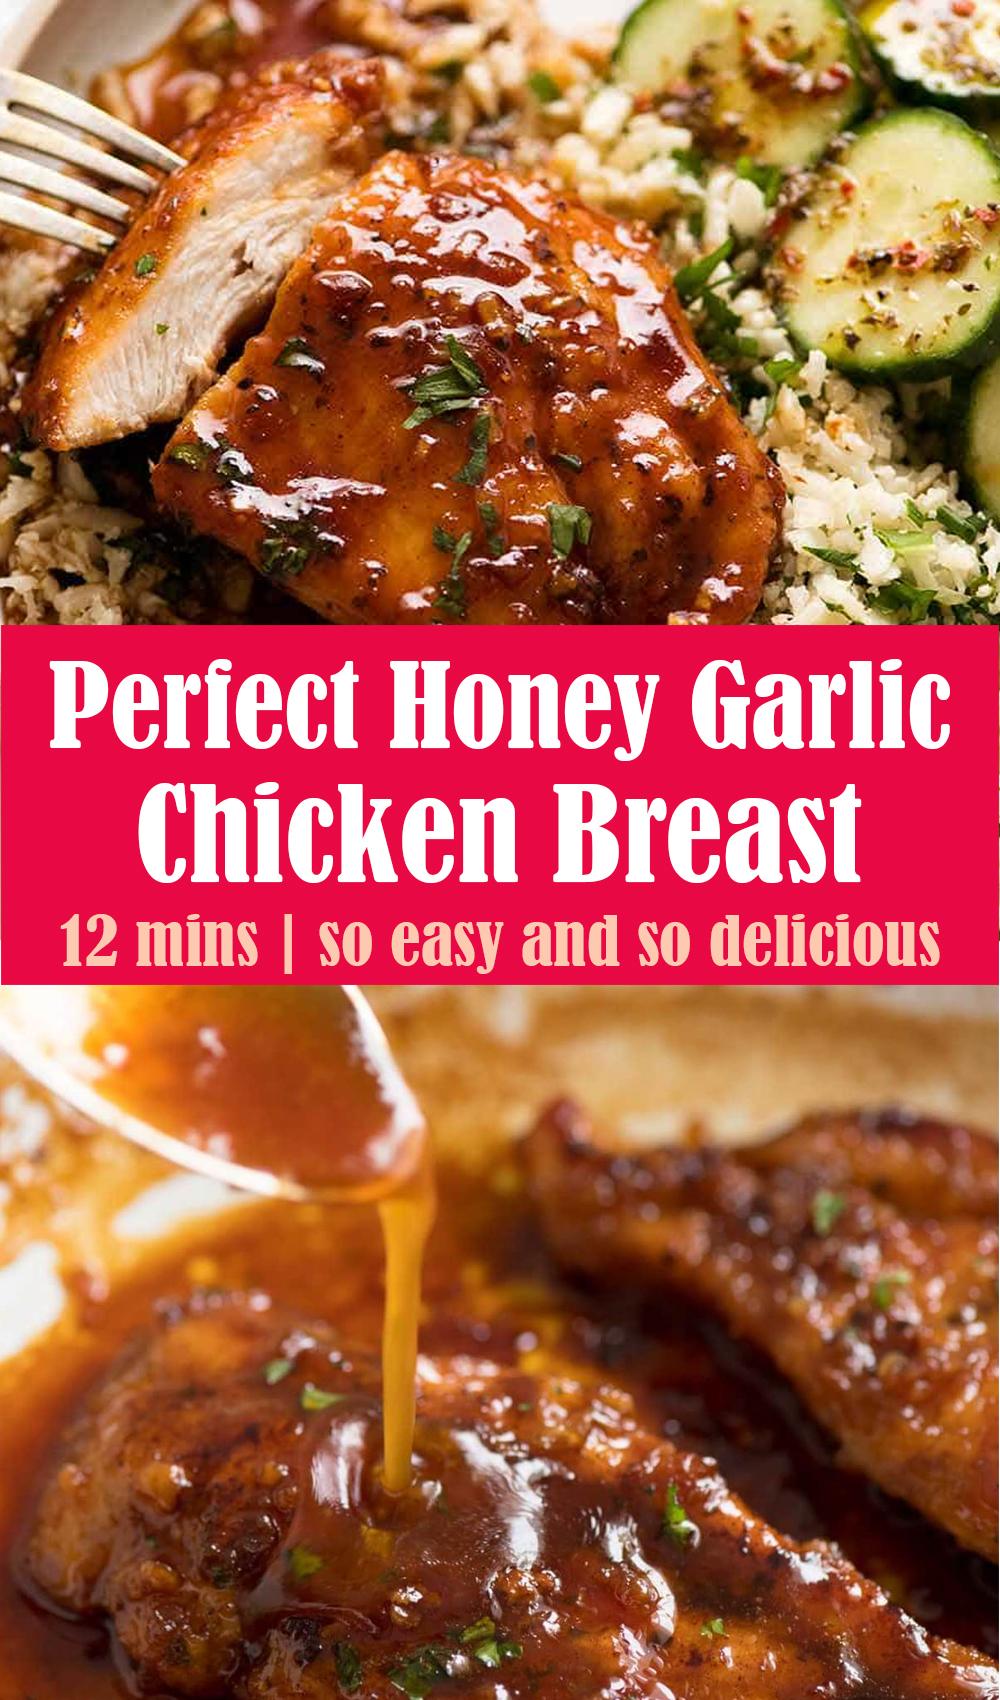 https://www.recipetineats.com/honey-garlic-chicken/